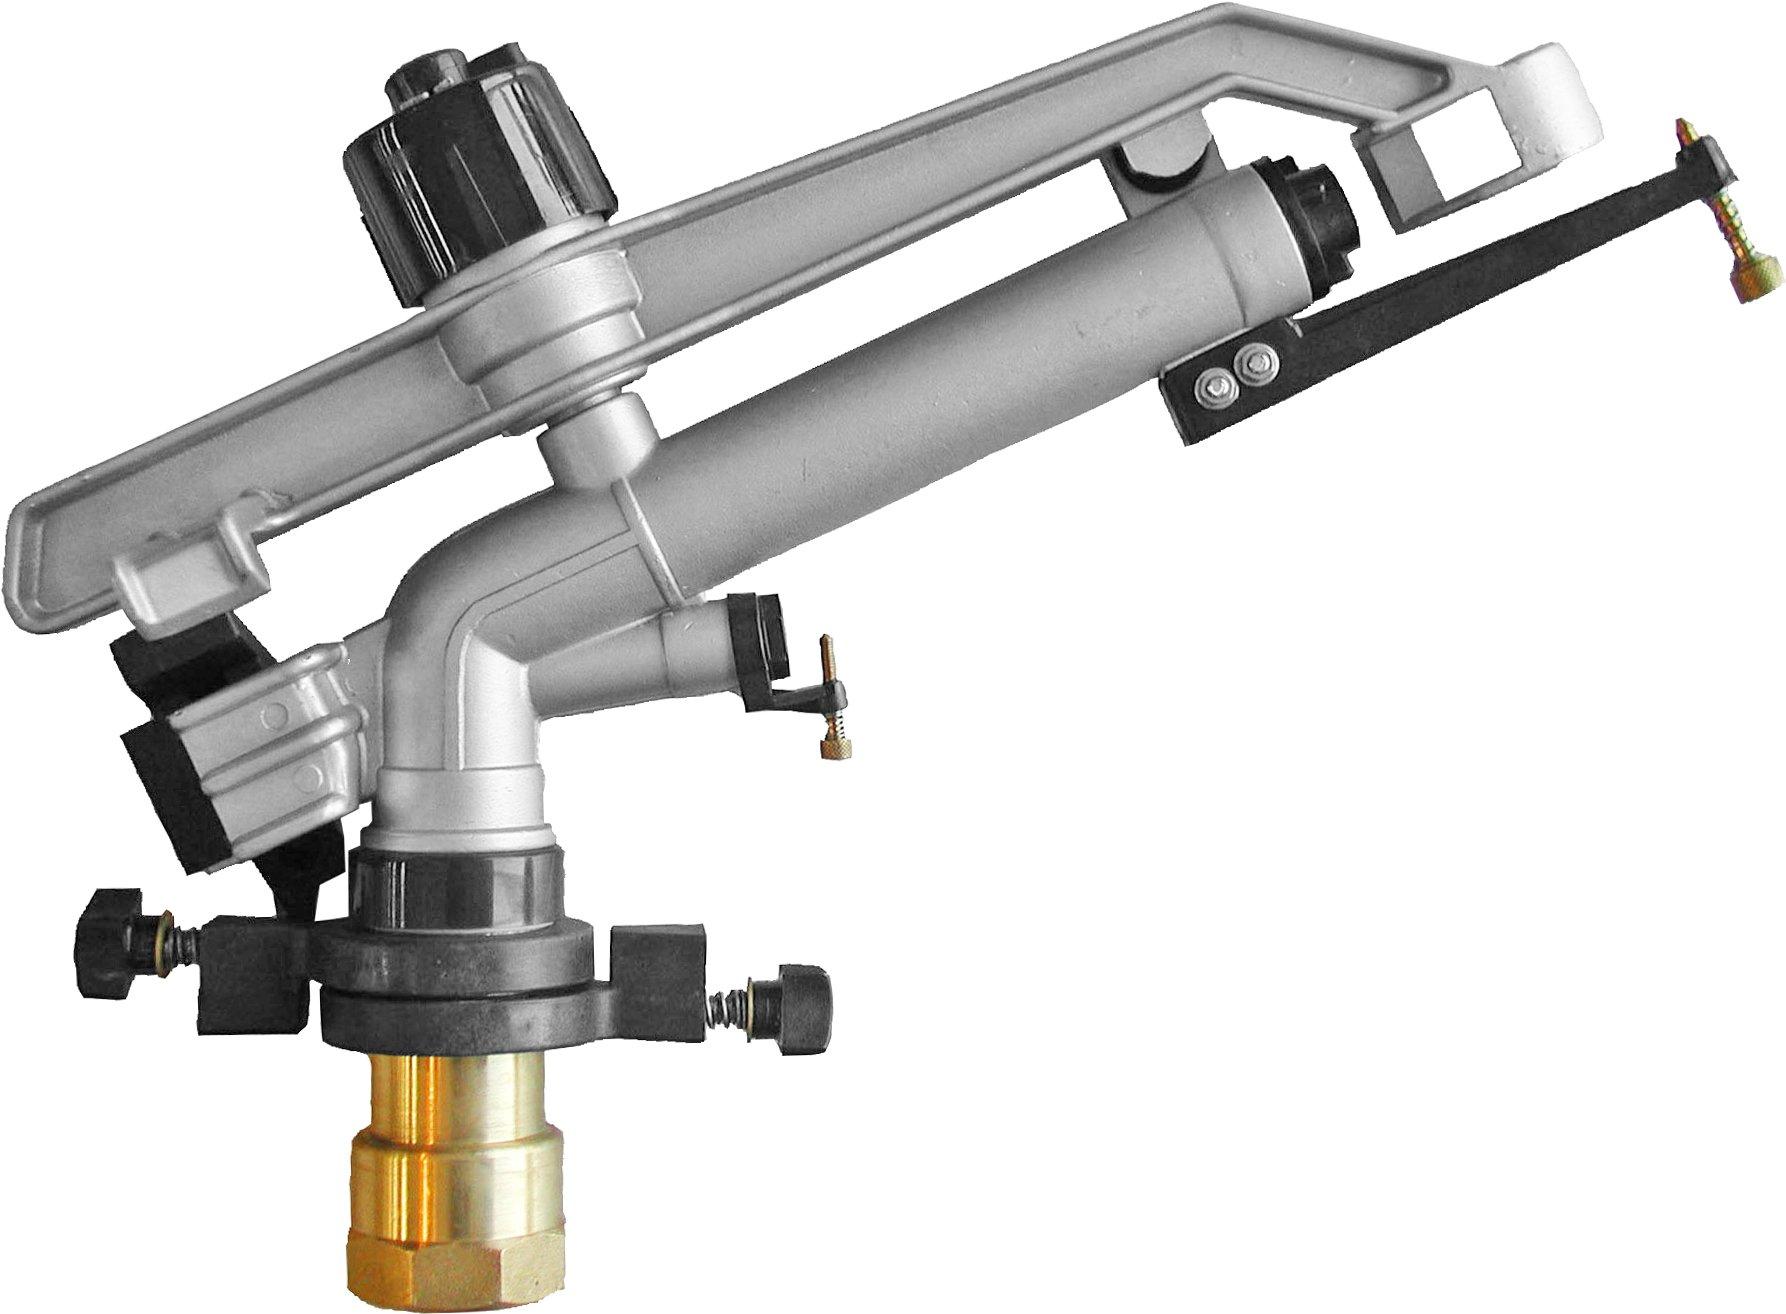 IrrigationKing RK-67 1-1/2'' FNPT Impact Mini-Gun Sprinkler with Nozzle Set - (12, 14, 16 mm) x 5 mm, NPT Female, 103.3 GSM Maximum Flow Rate